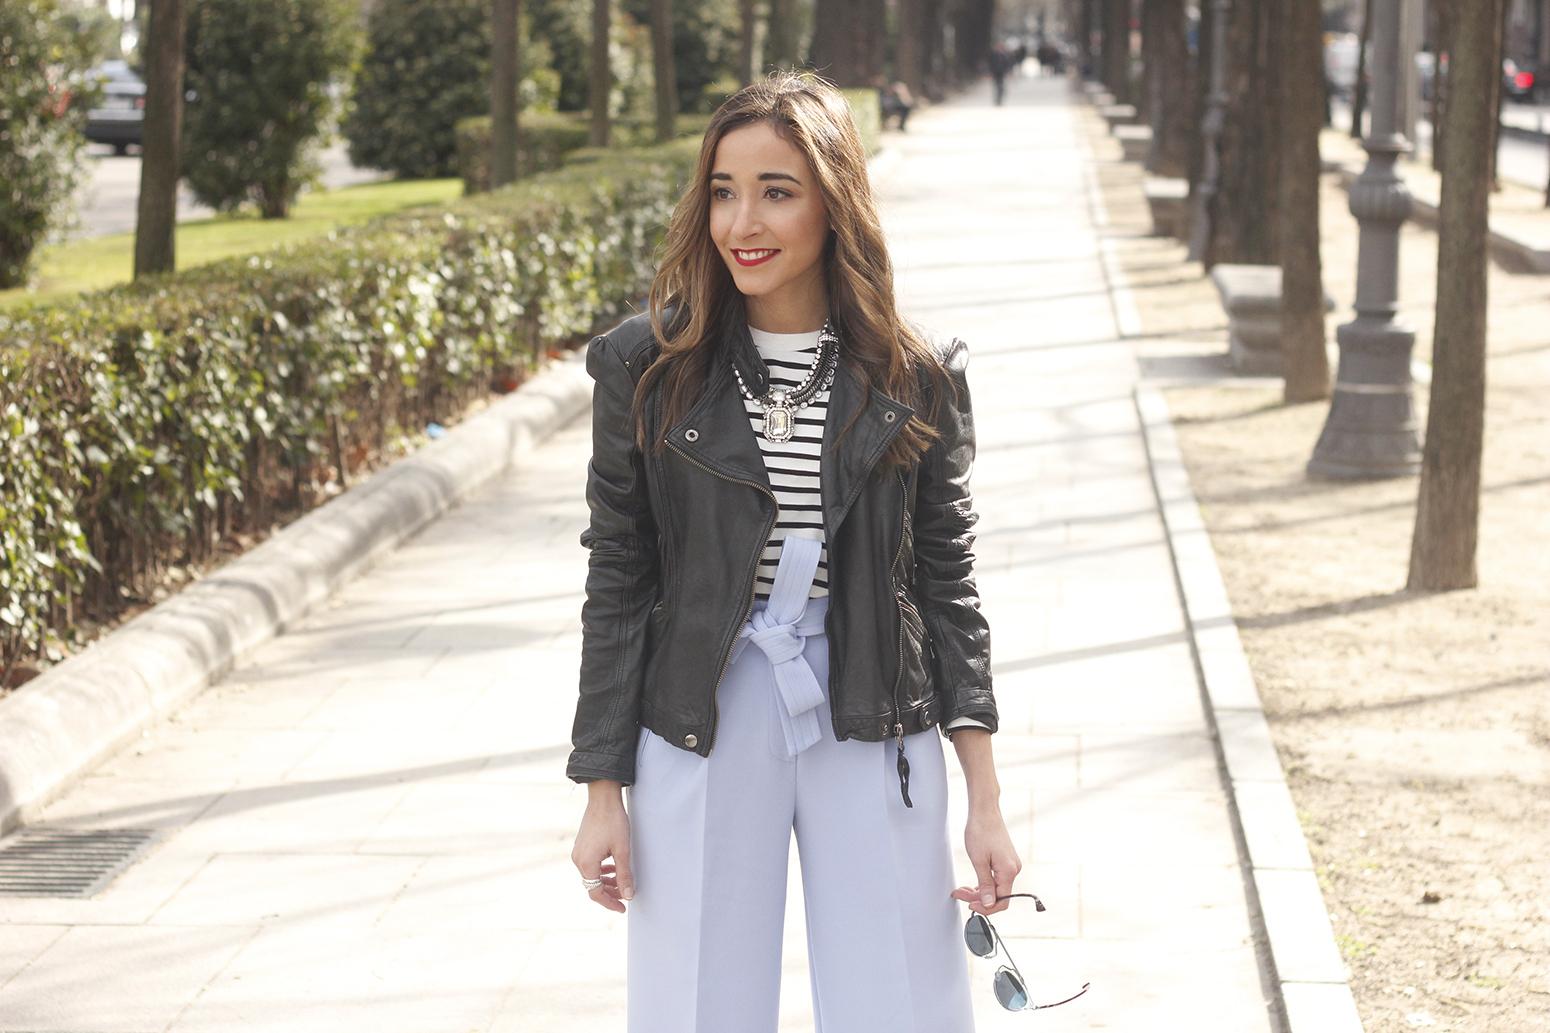 Light Blue Pallazzo pants t-shirt stripes black heels biker jacket dior so real sunglasses outfit style fashion12